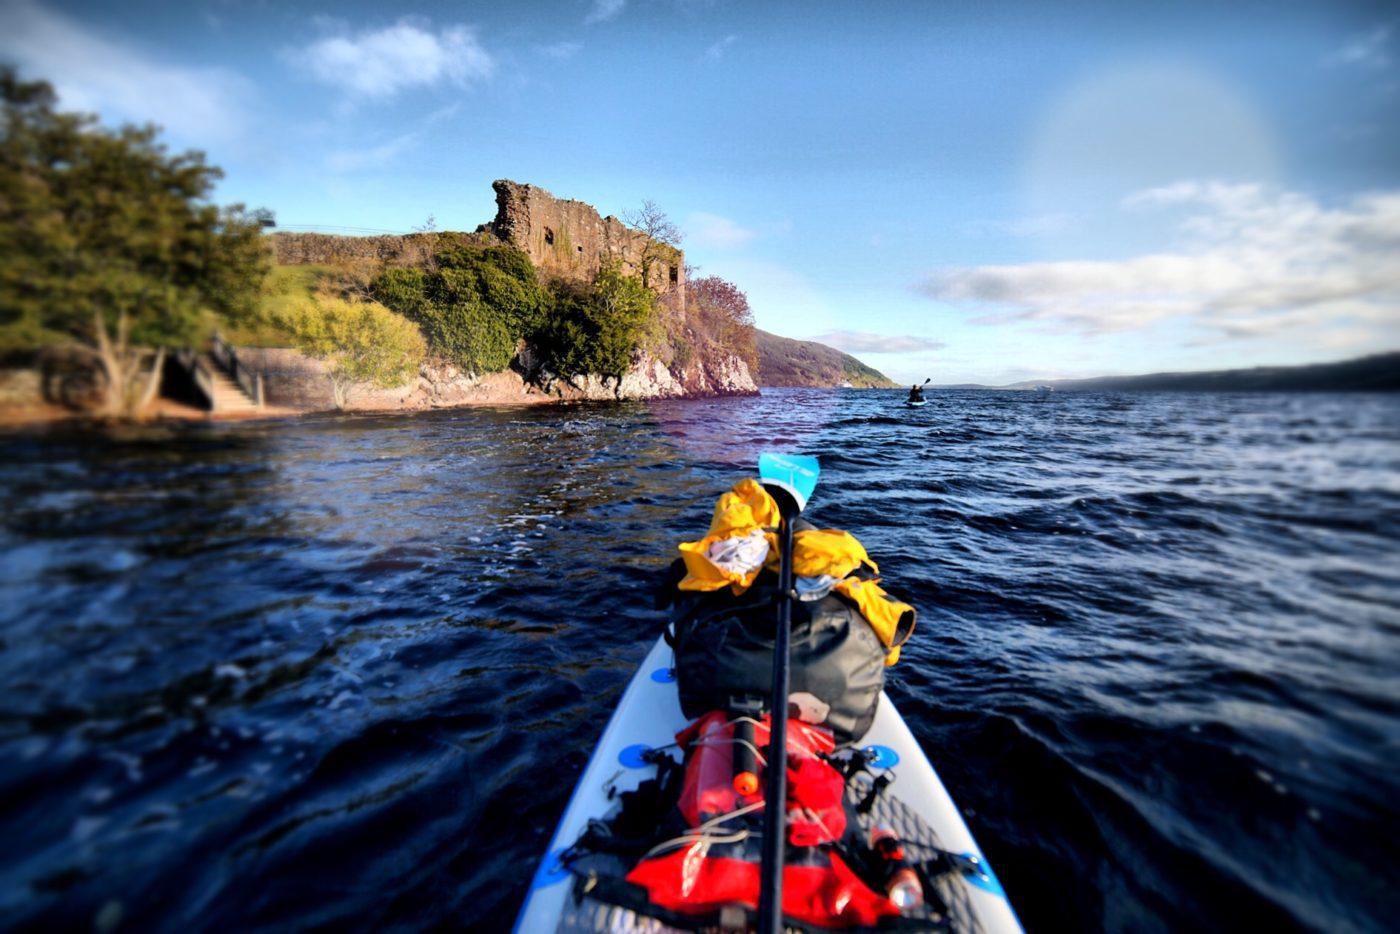 Urqhart Castle Loch Ness by SUP touring board ian Burton